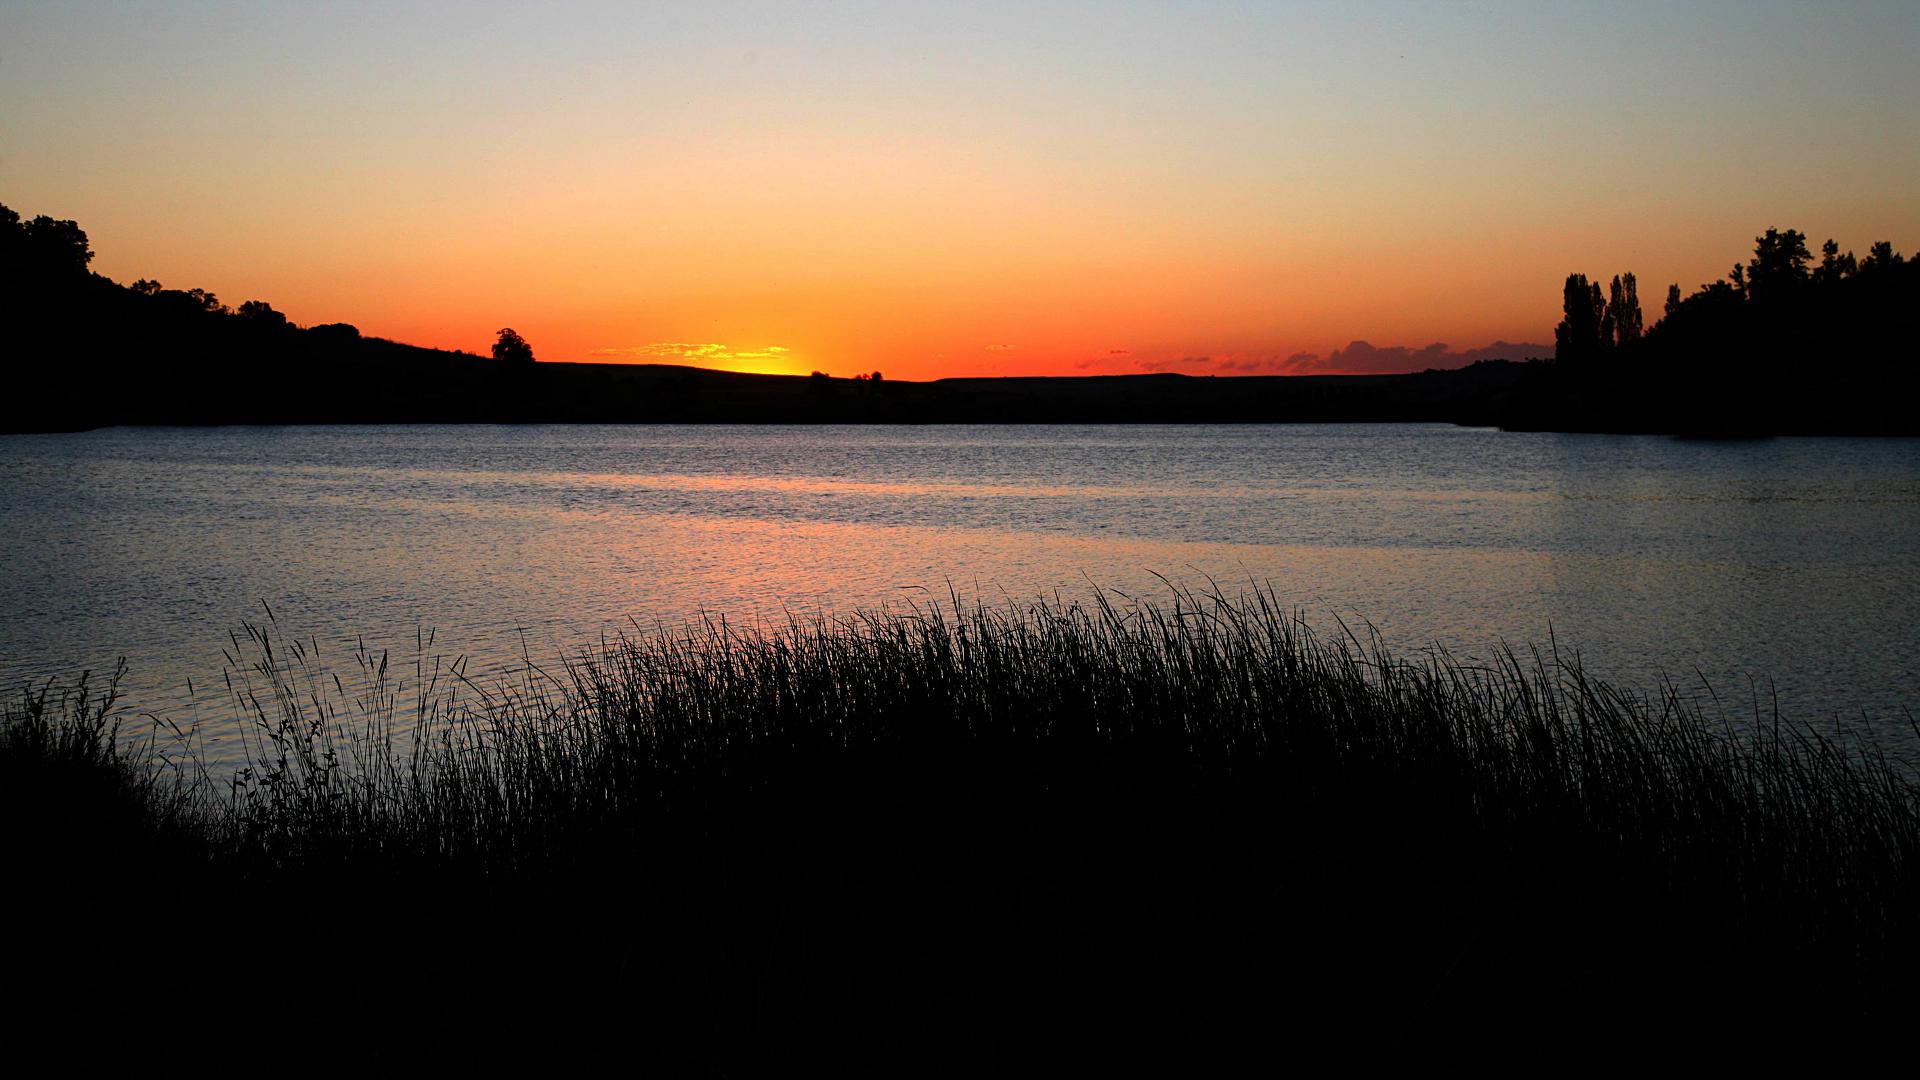 sunset wallpaper 45276